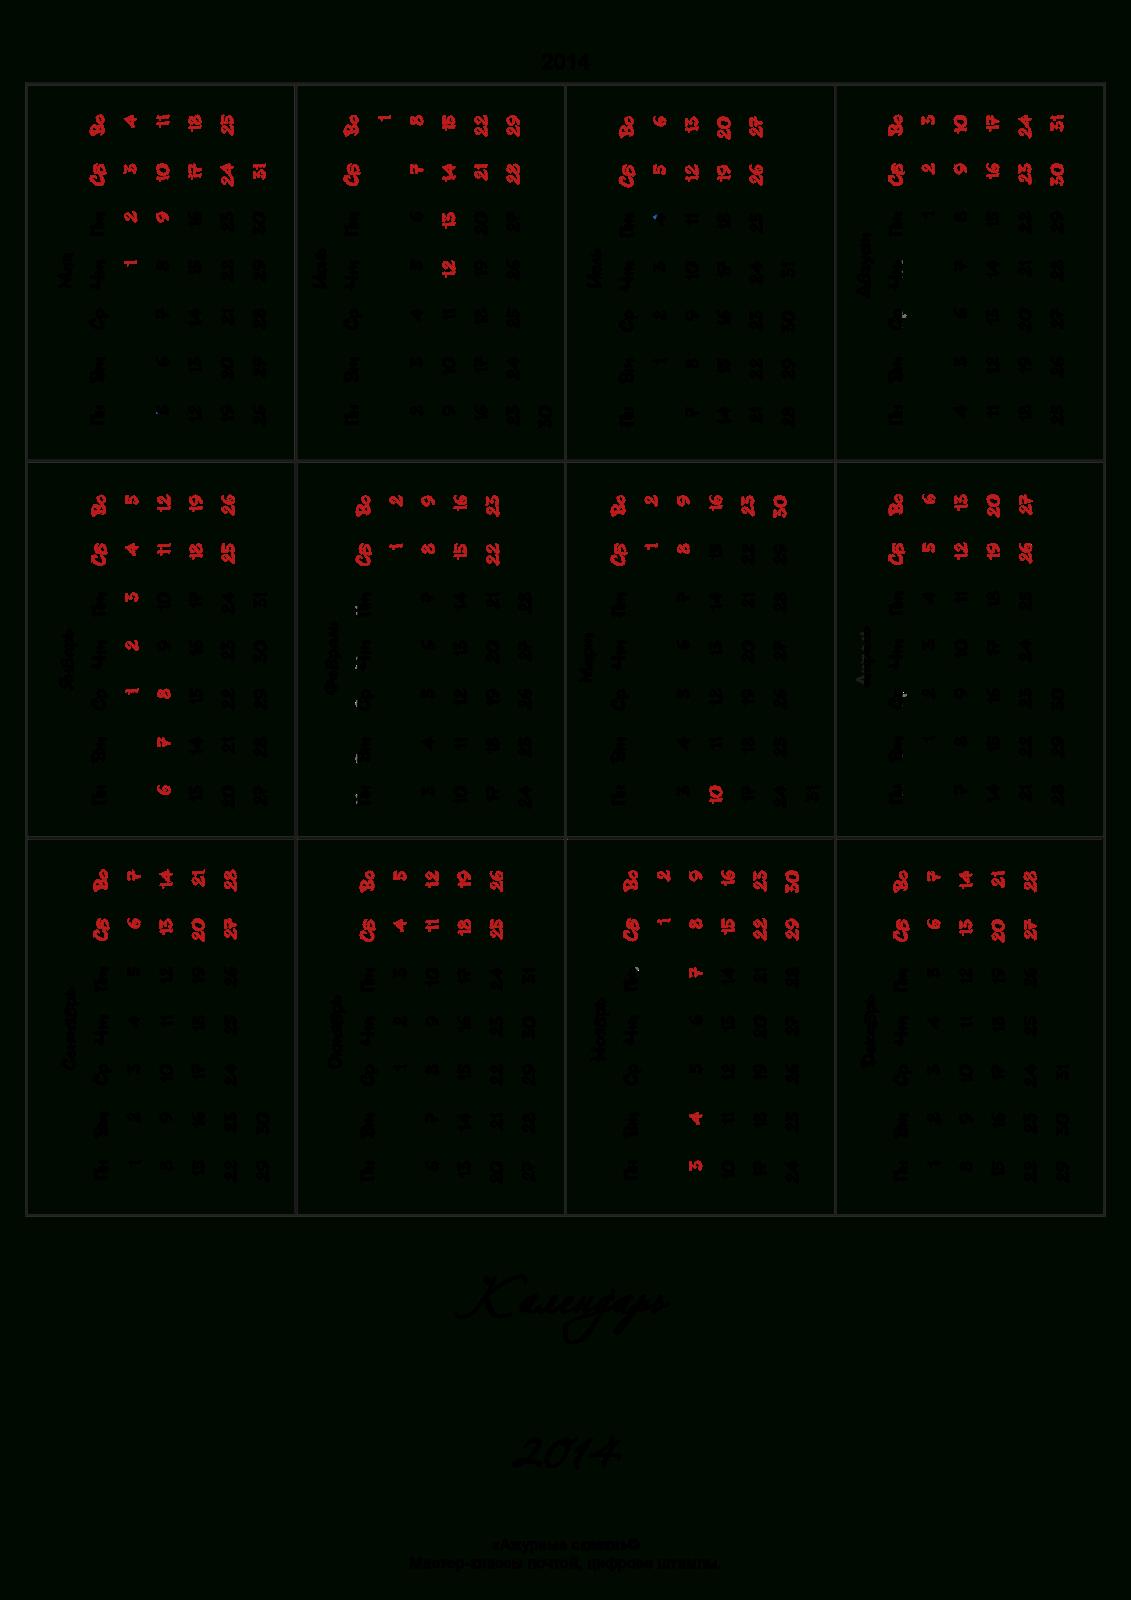 Anthesis: Шаблон. Календарные Сетки На 2014 Год.